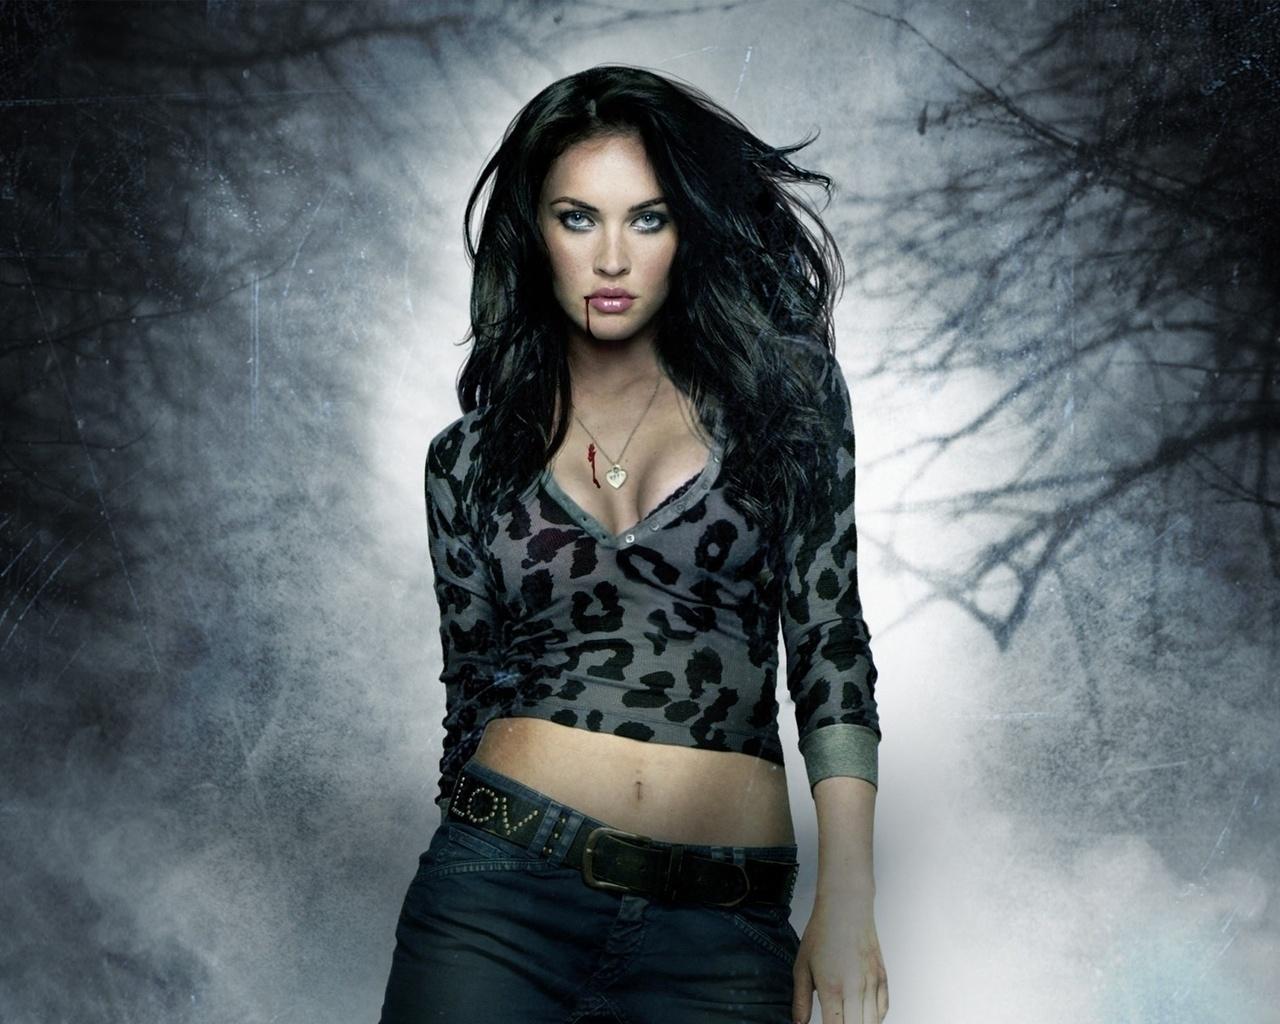 Megan Fox Megan Fox Movies widescreen 1280x1024 on the desktop 1280x1024